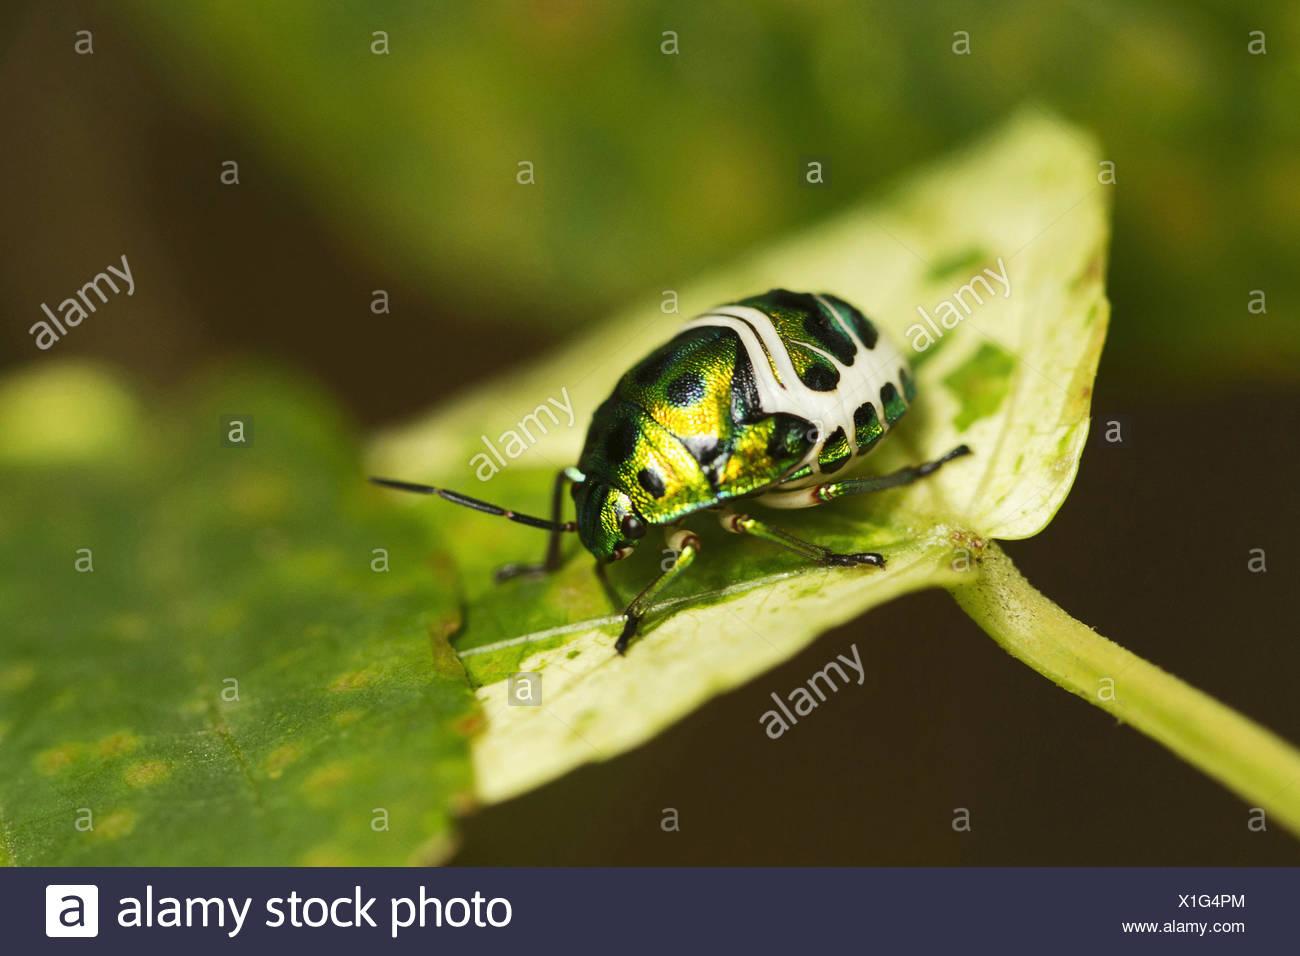 Jewel Bug or Shield Backed Bug in the family Scutelleridae. Chrysocoris stolli. Chorla Ghats Mhadei Wildlife Sanctuary Goa - Stock Image